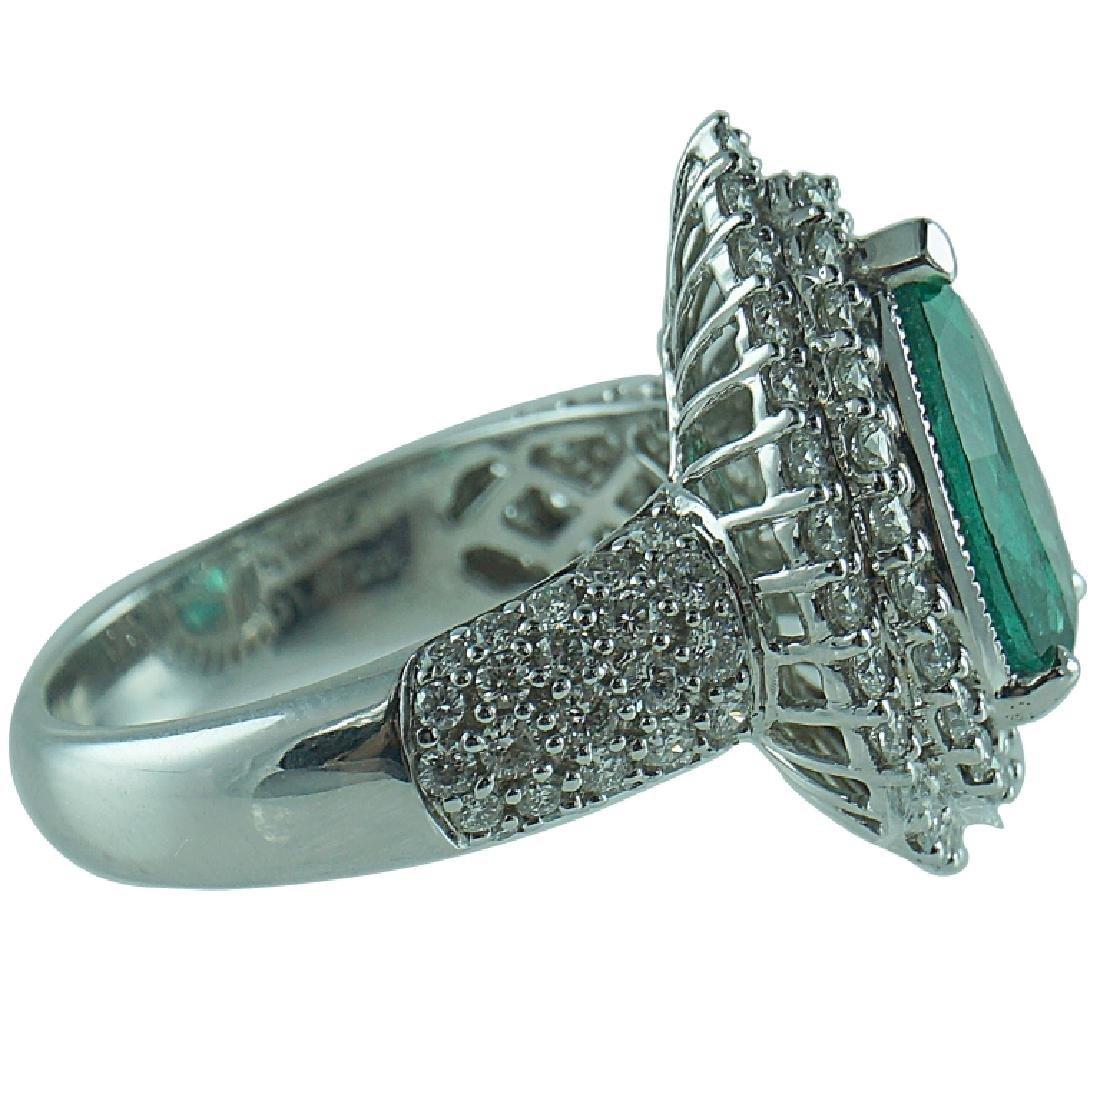 18 Karat WG 2.72 Carat Emerald 1.47 TCW Diamond - 2